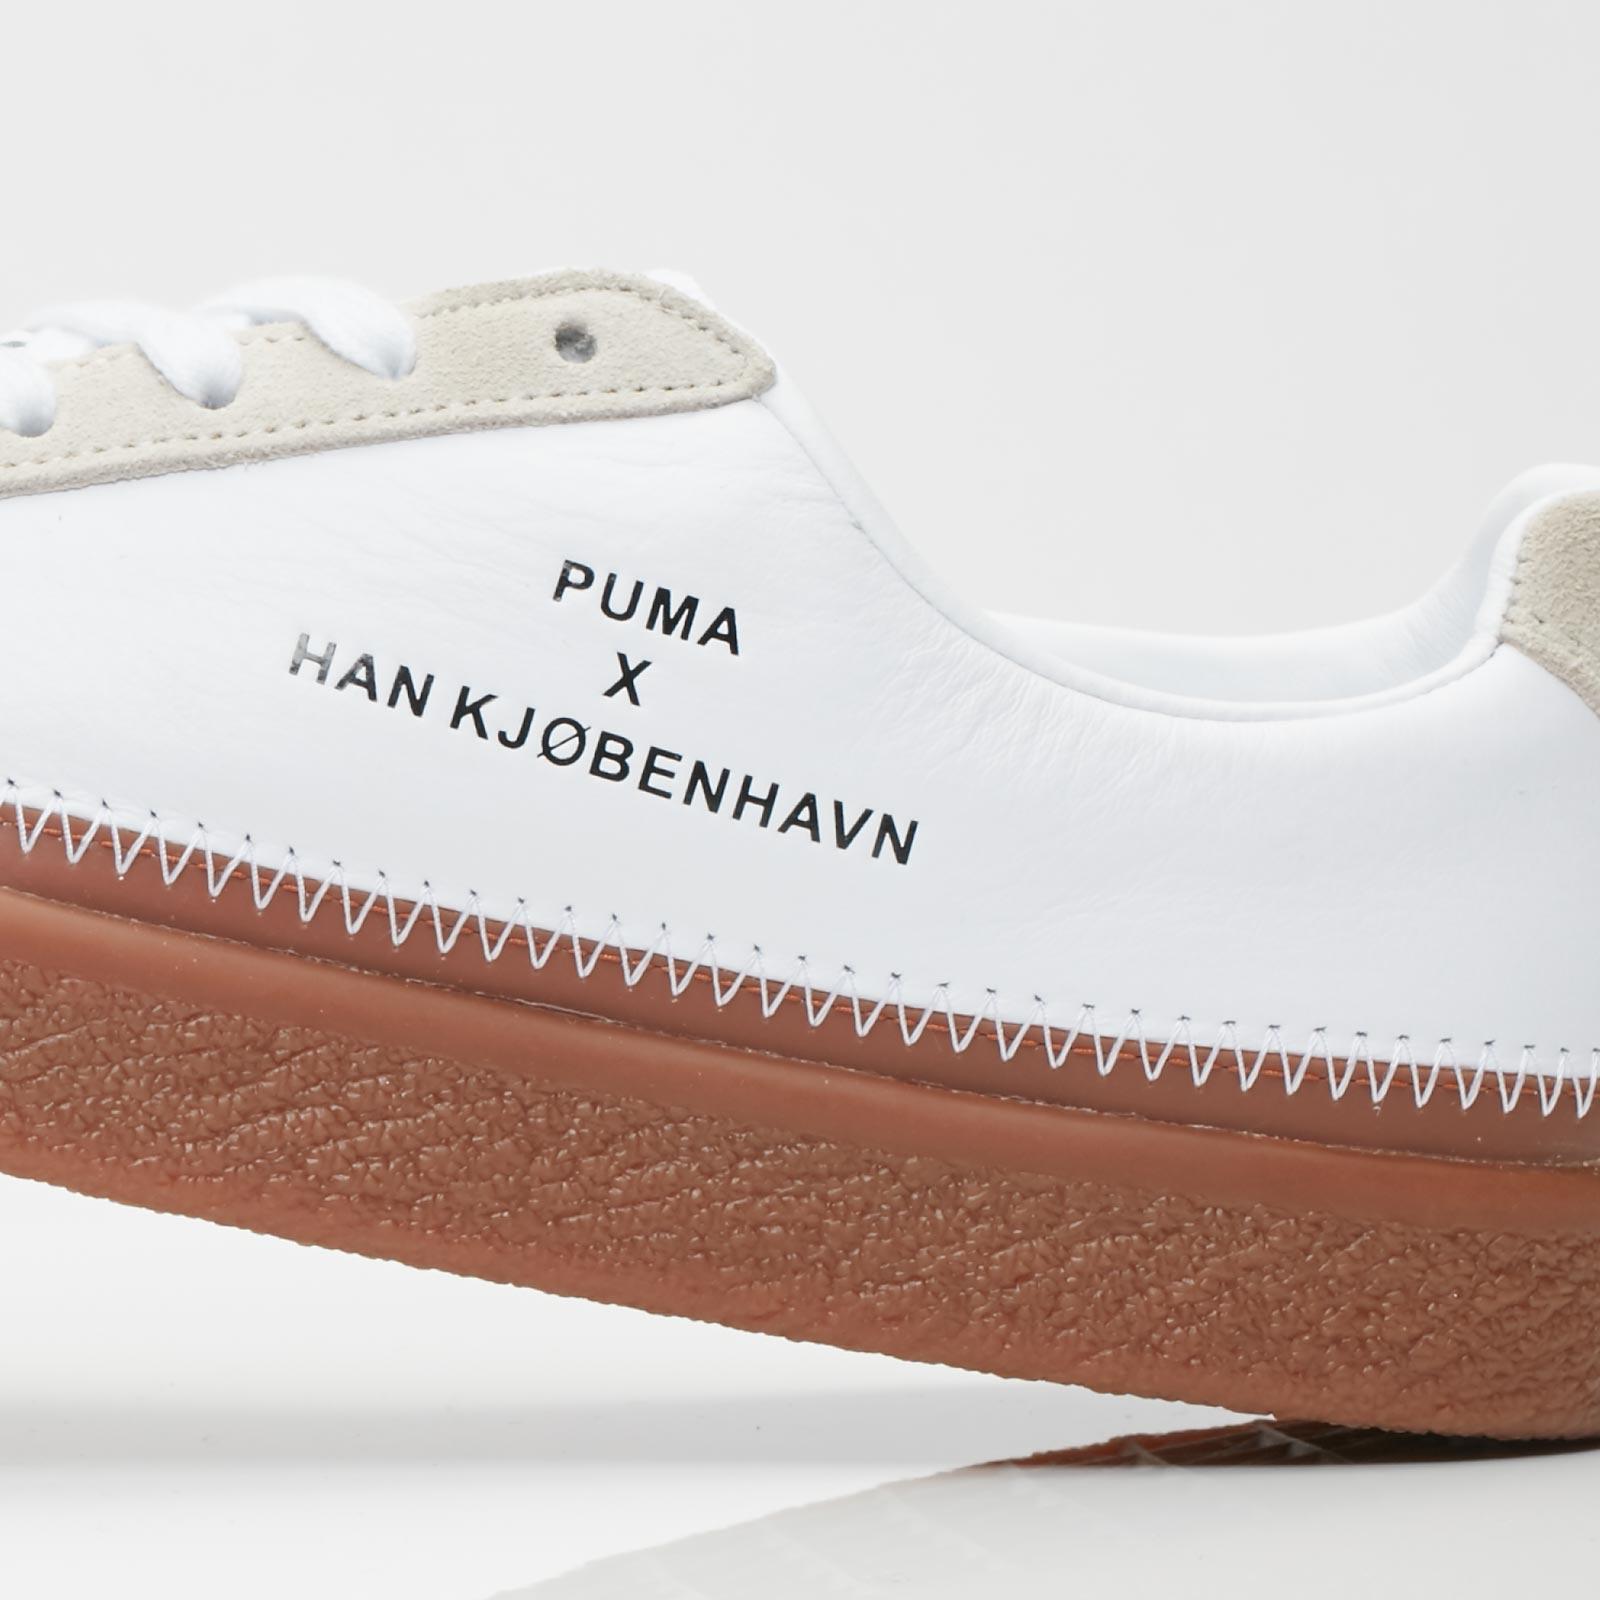 Puma Clyde Stitched x Han Kjøbenhavn - 364474-01 - Sneakersnstuff ... af7de93b8